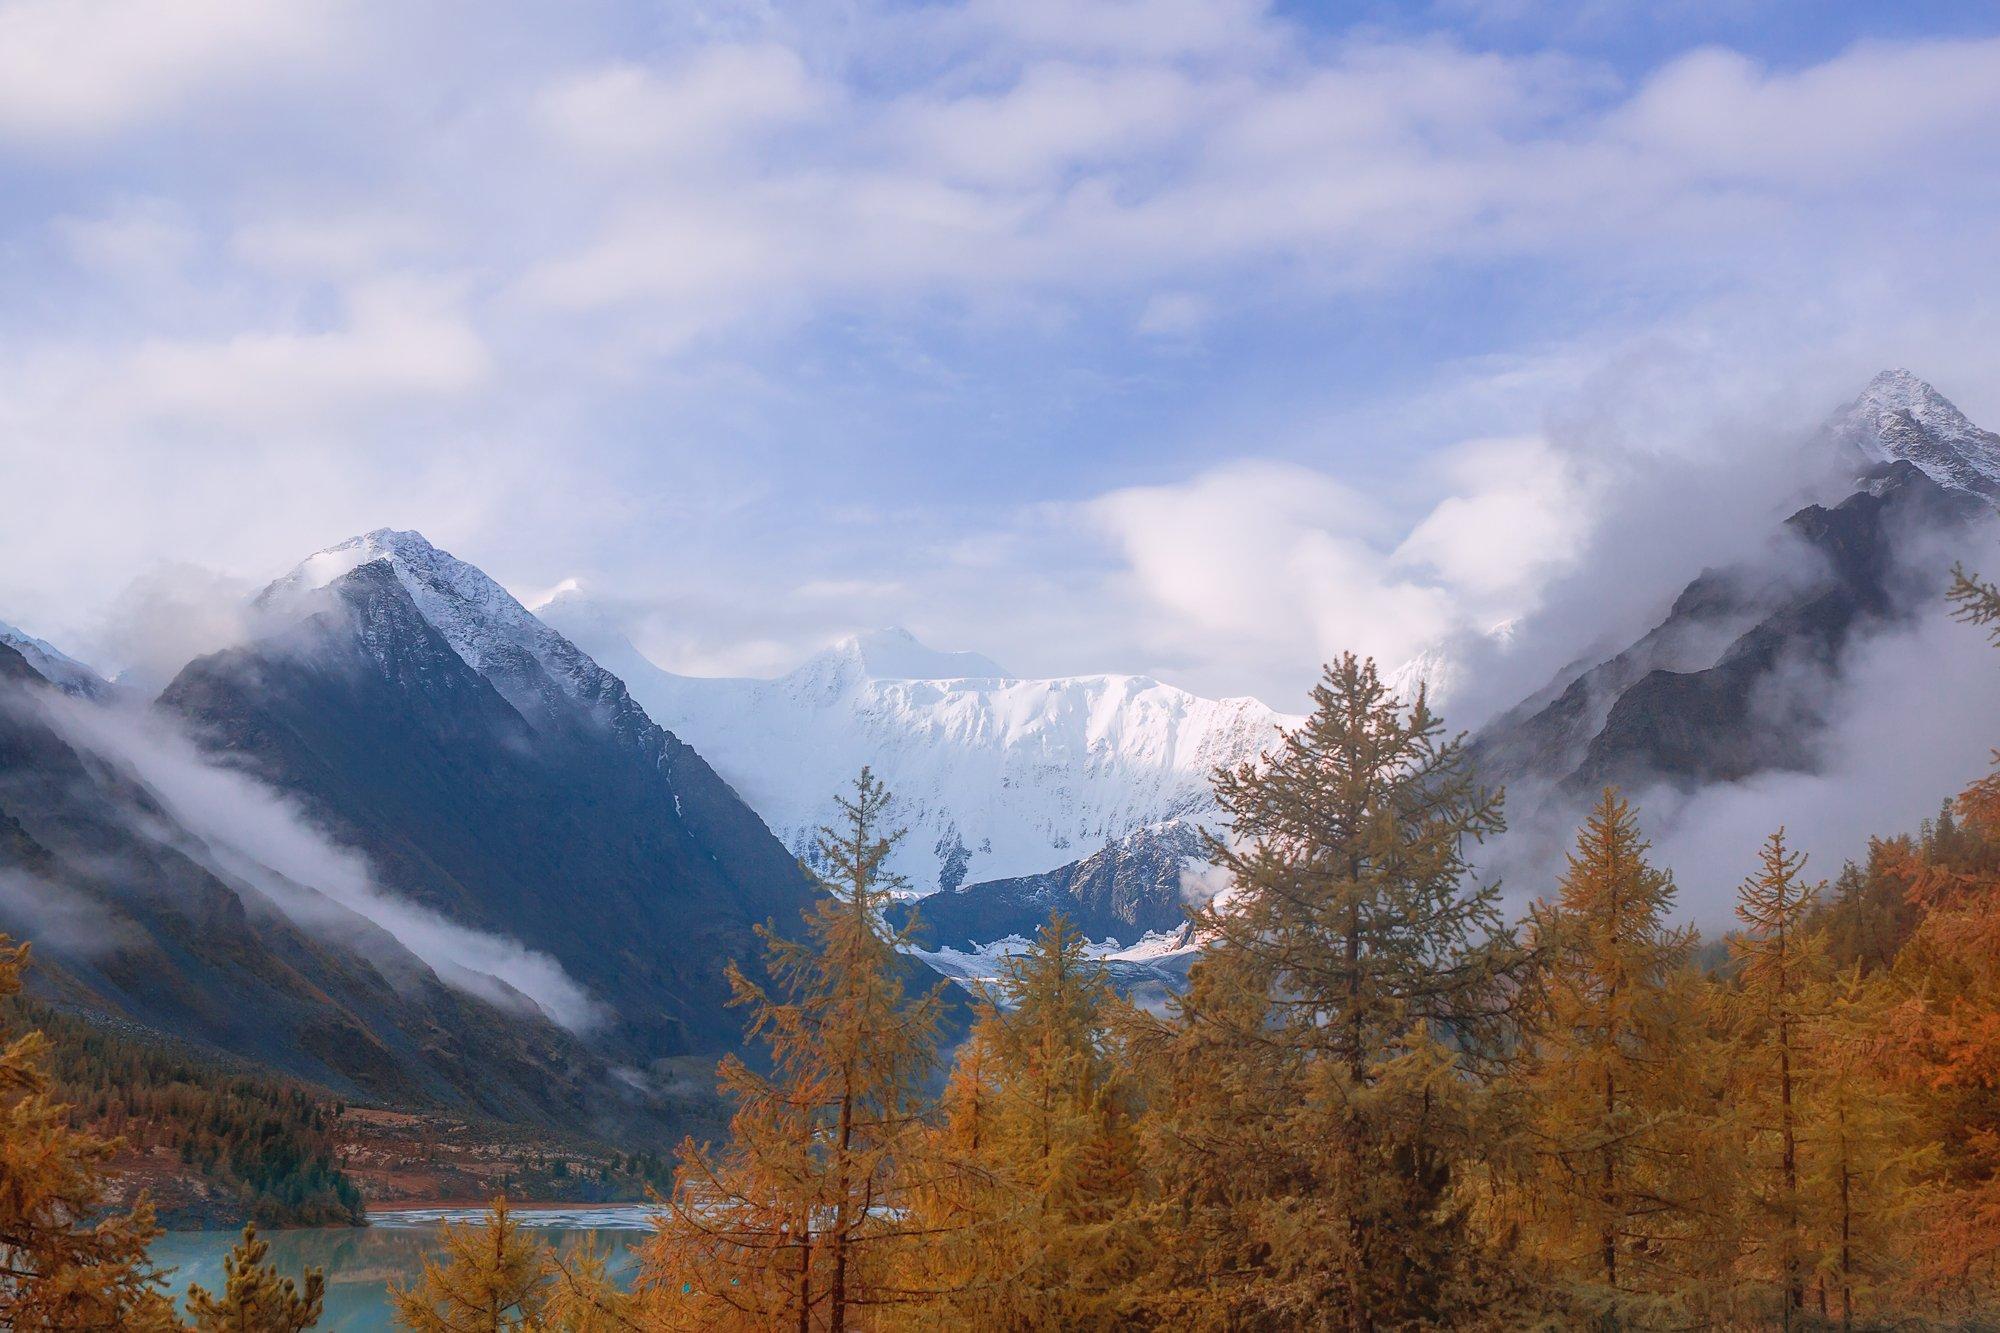 гора, ледник,белуха, горныйалтай, осень, туман,, Кузнецов Сергей